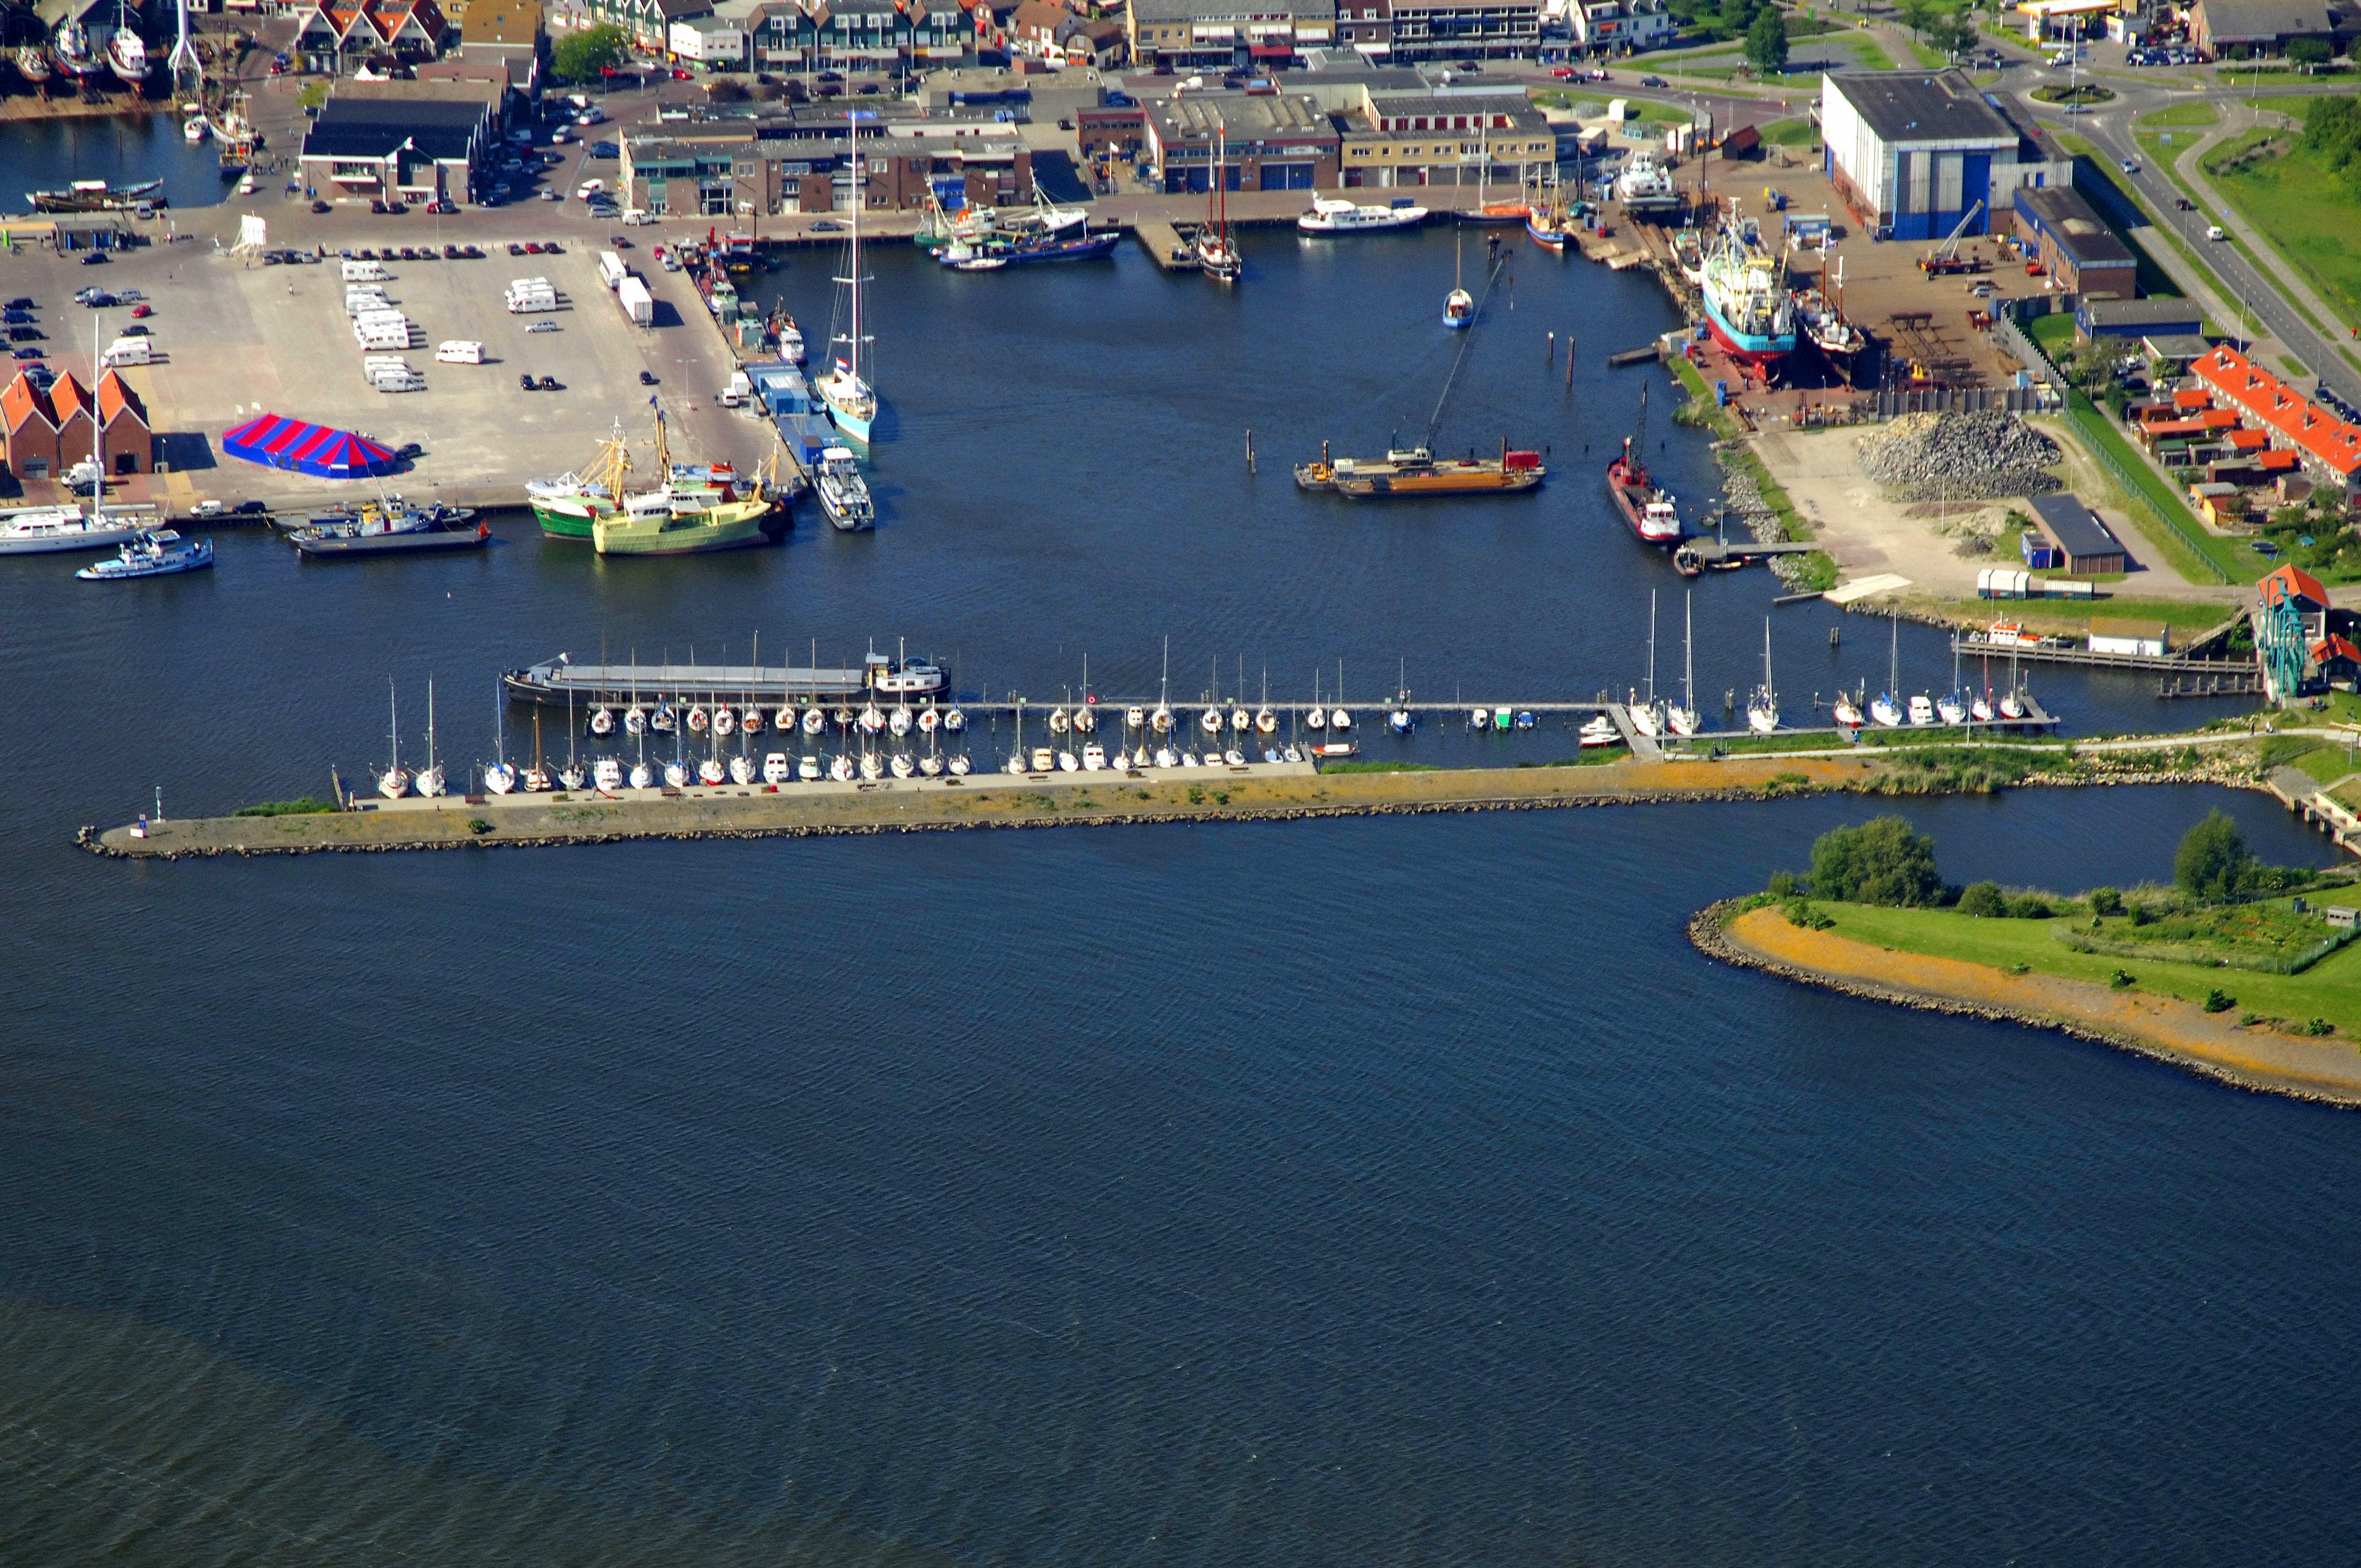 Urk Marina in Urk, Flevoland, Netherlands - Marina Reviews - Phone Number -  Marinas.com